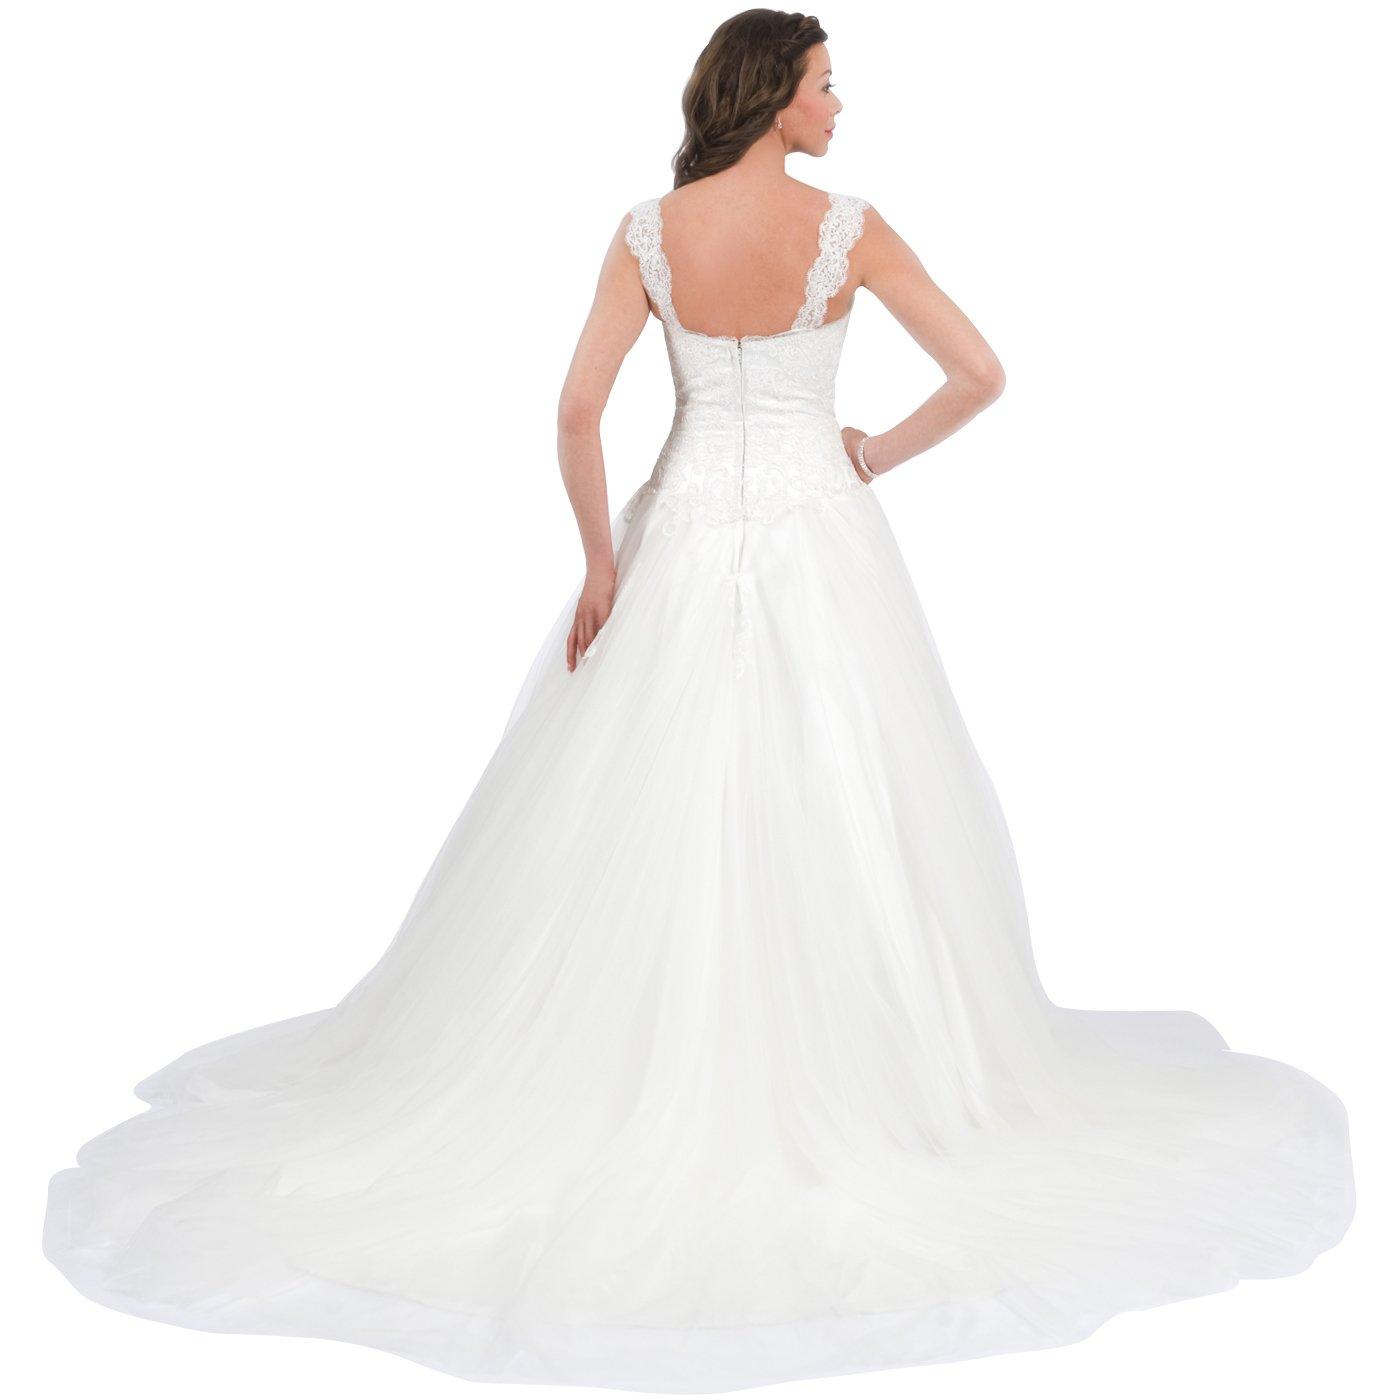 Lux Bridal Women S Misha Sweetheart Neckline Tulle Flare Wedding Dress